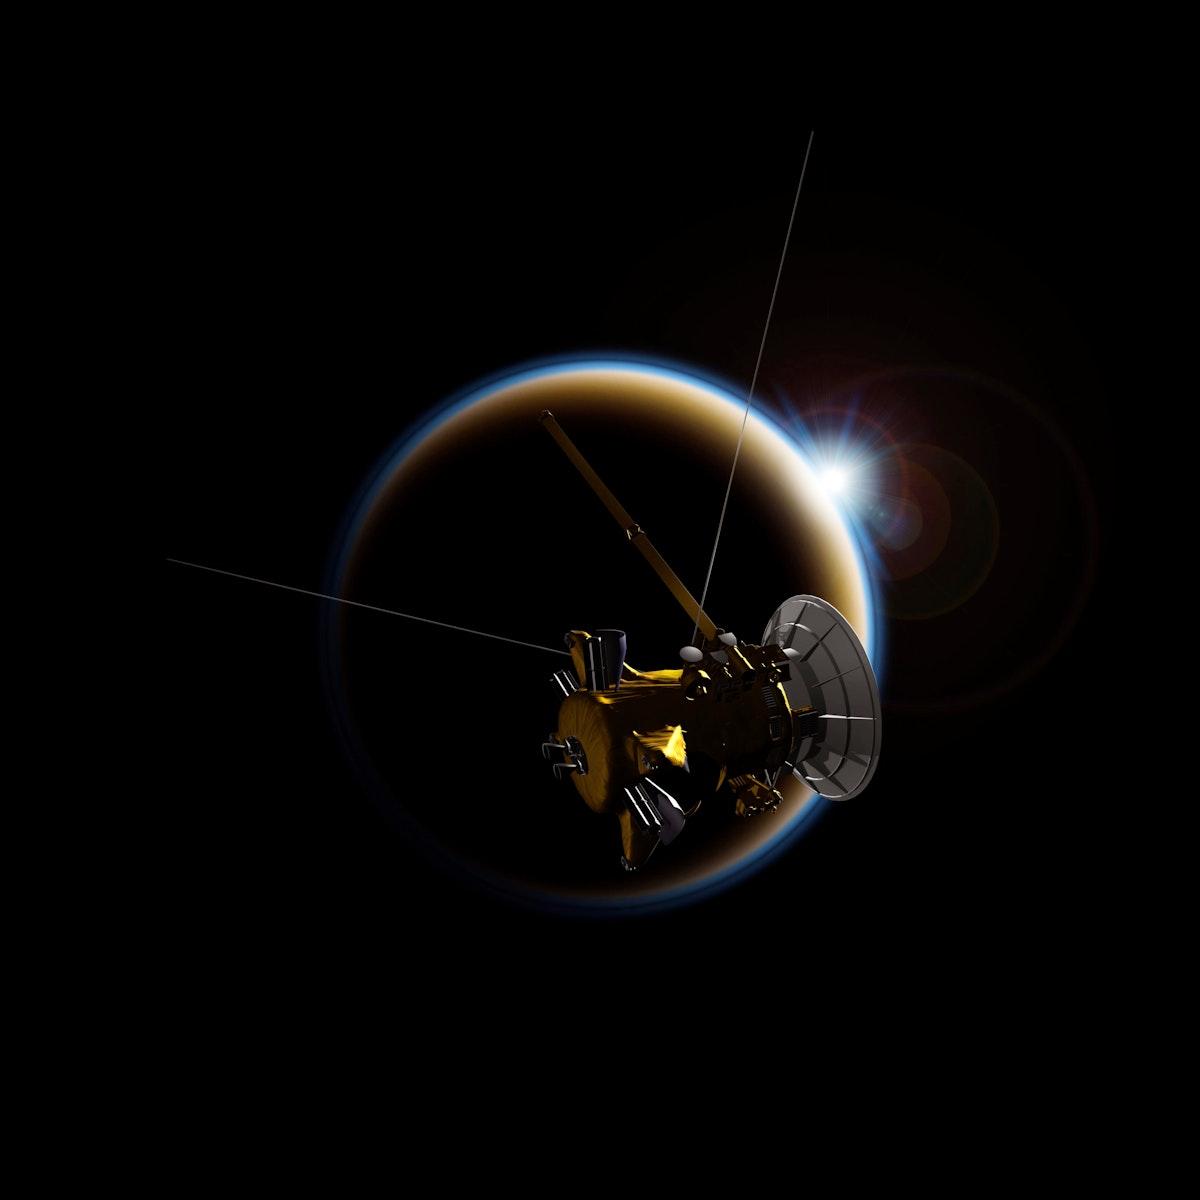 Artist's rendering of NASA's Cassini spacecraft observing a sunset through Titan's hazy atmosphere. Original from NASA.…